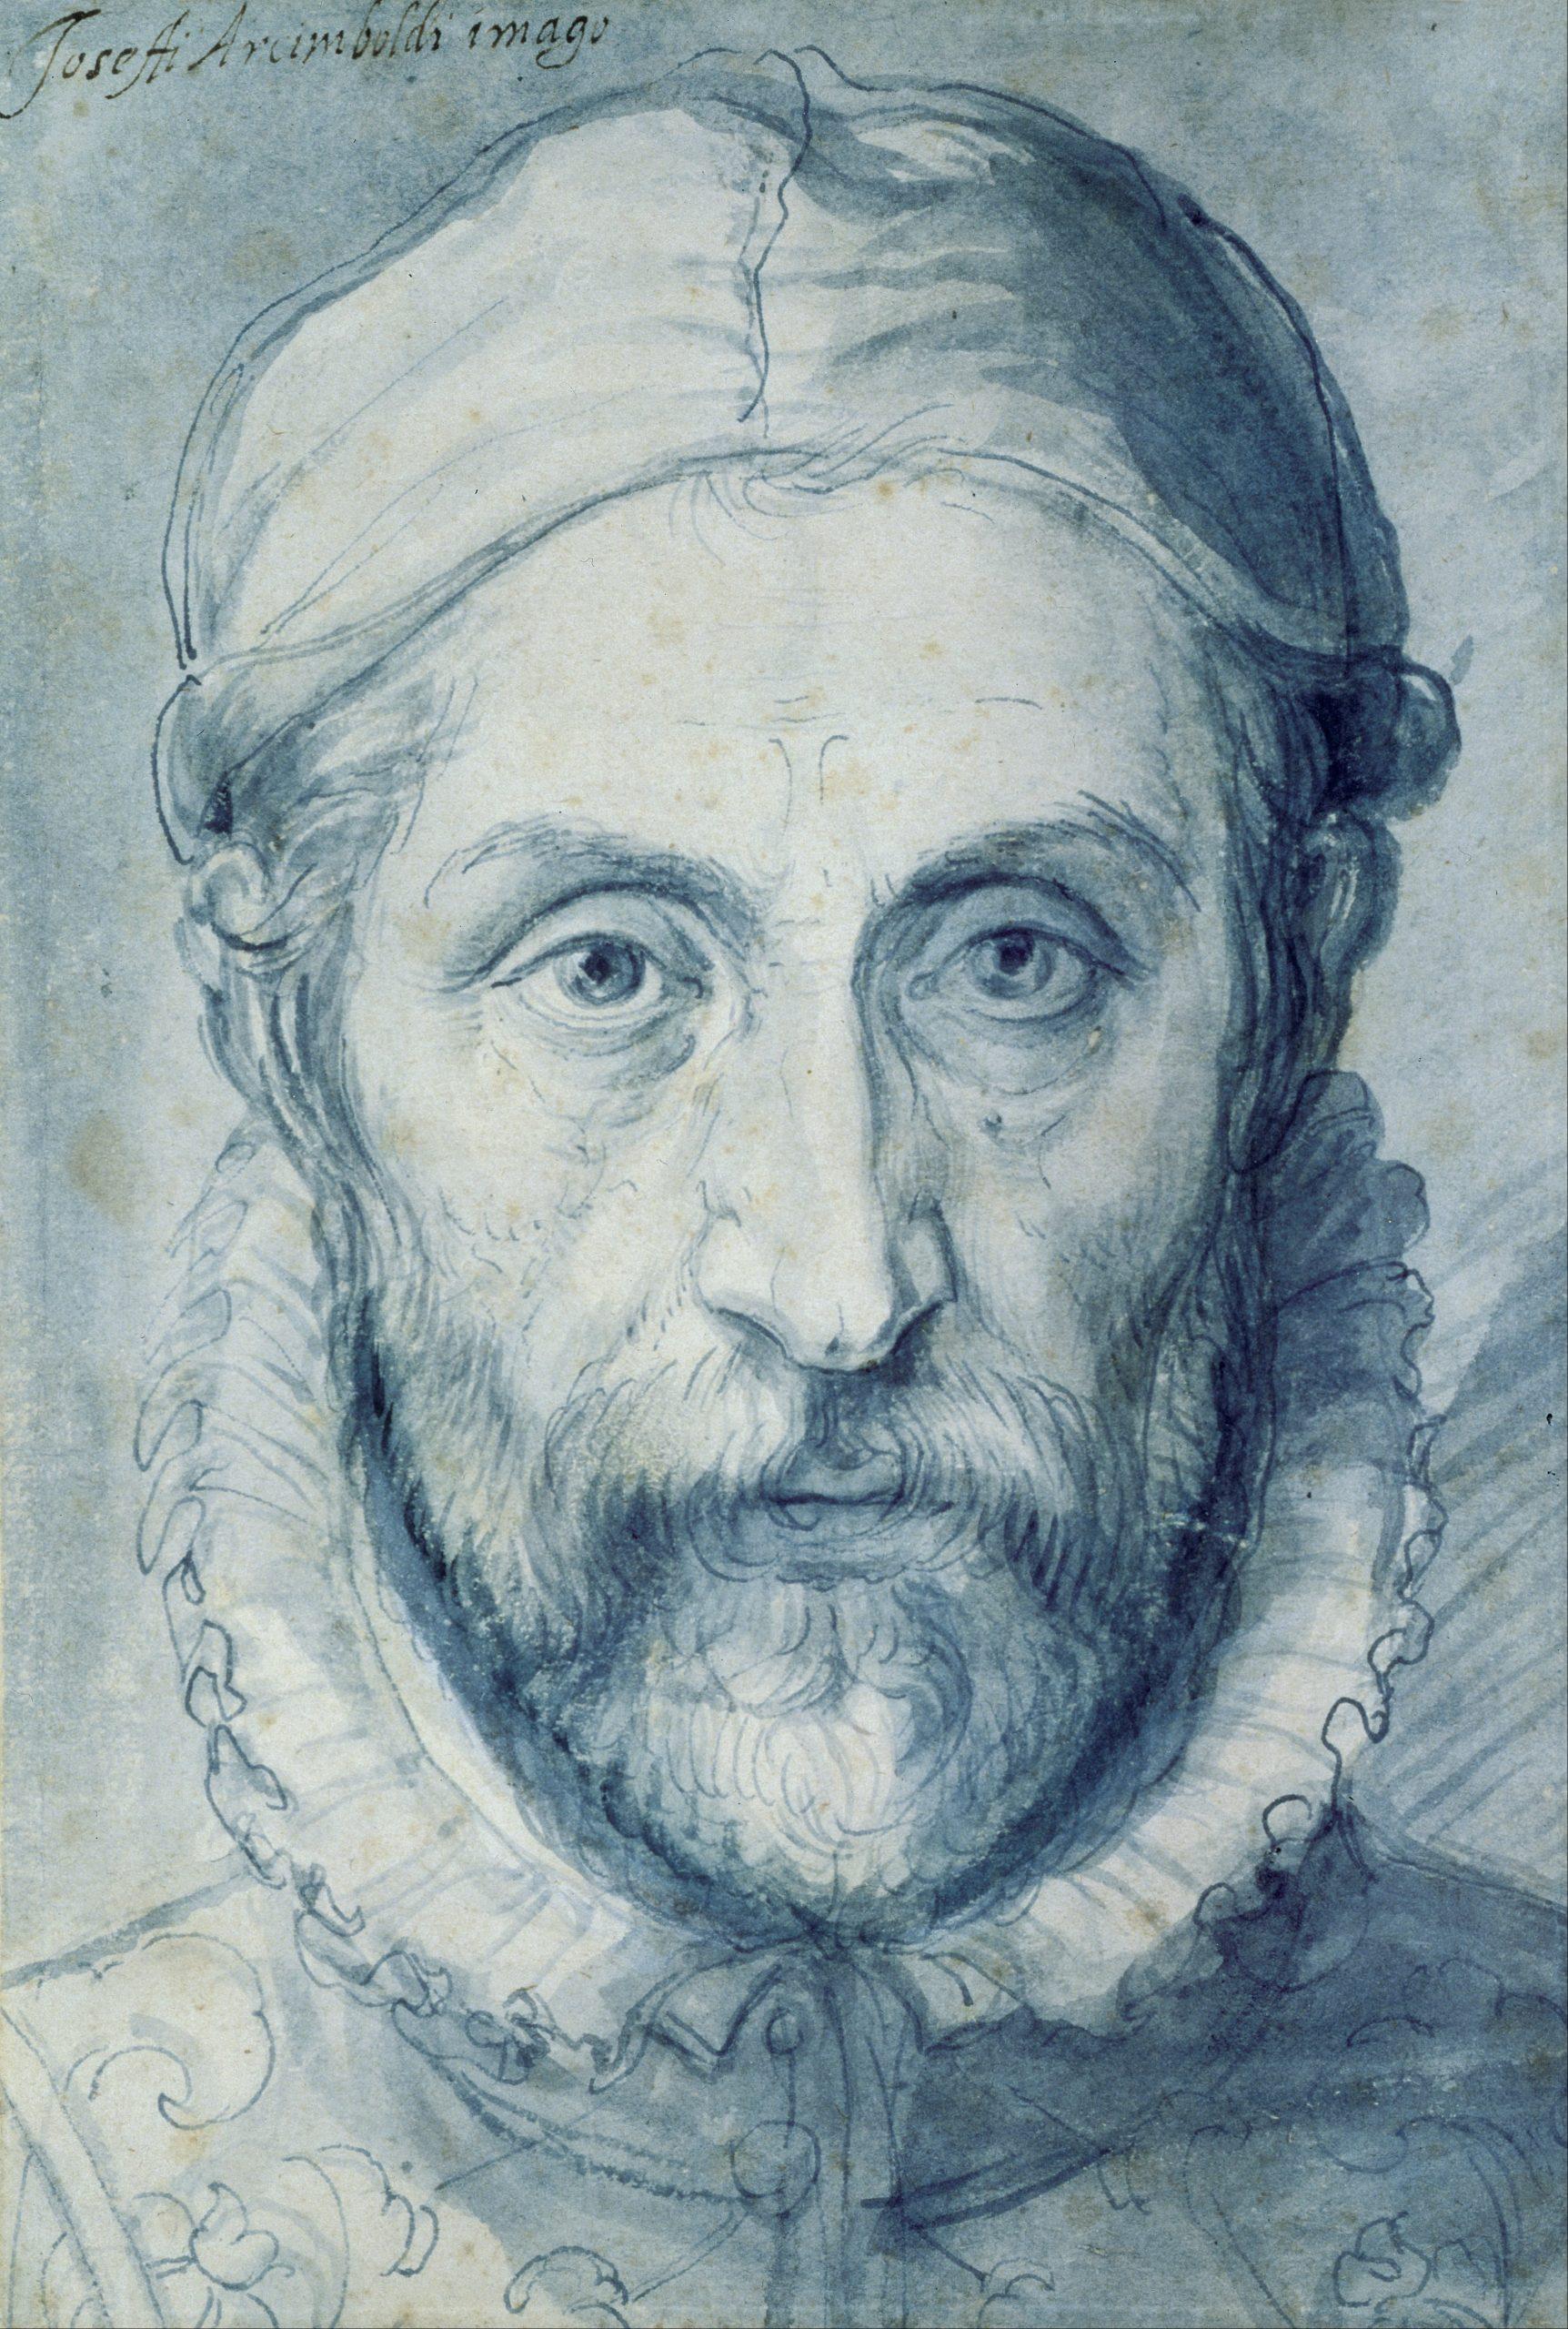 Giuseppe Arcimboldo, self portrait, 1570, National Gallery Prague